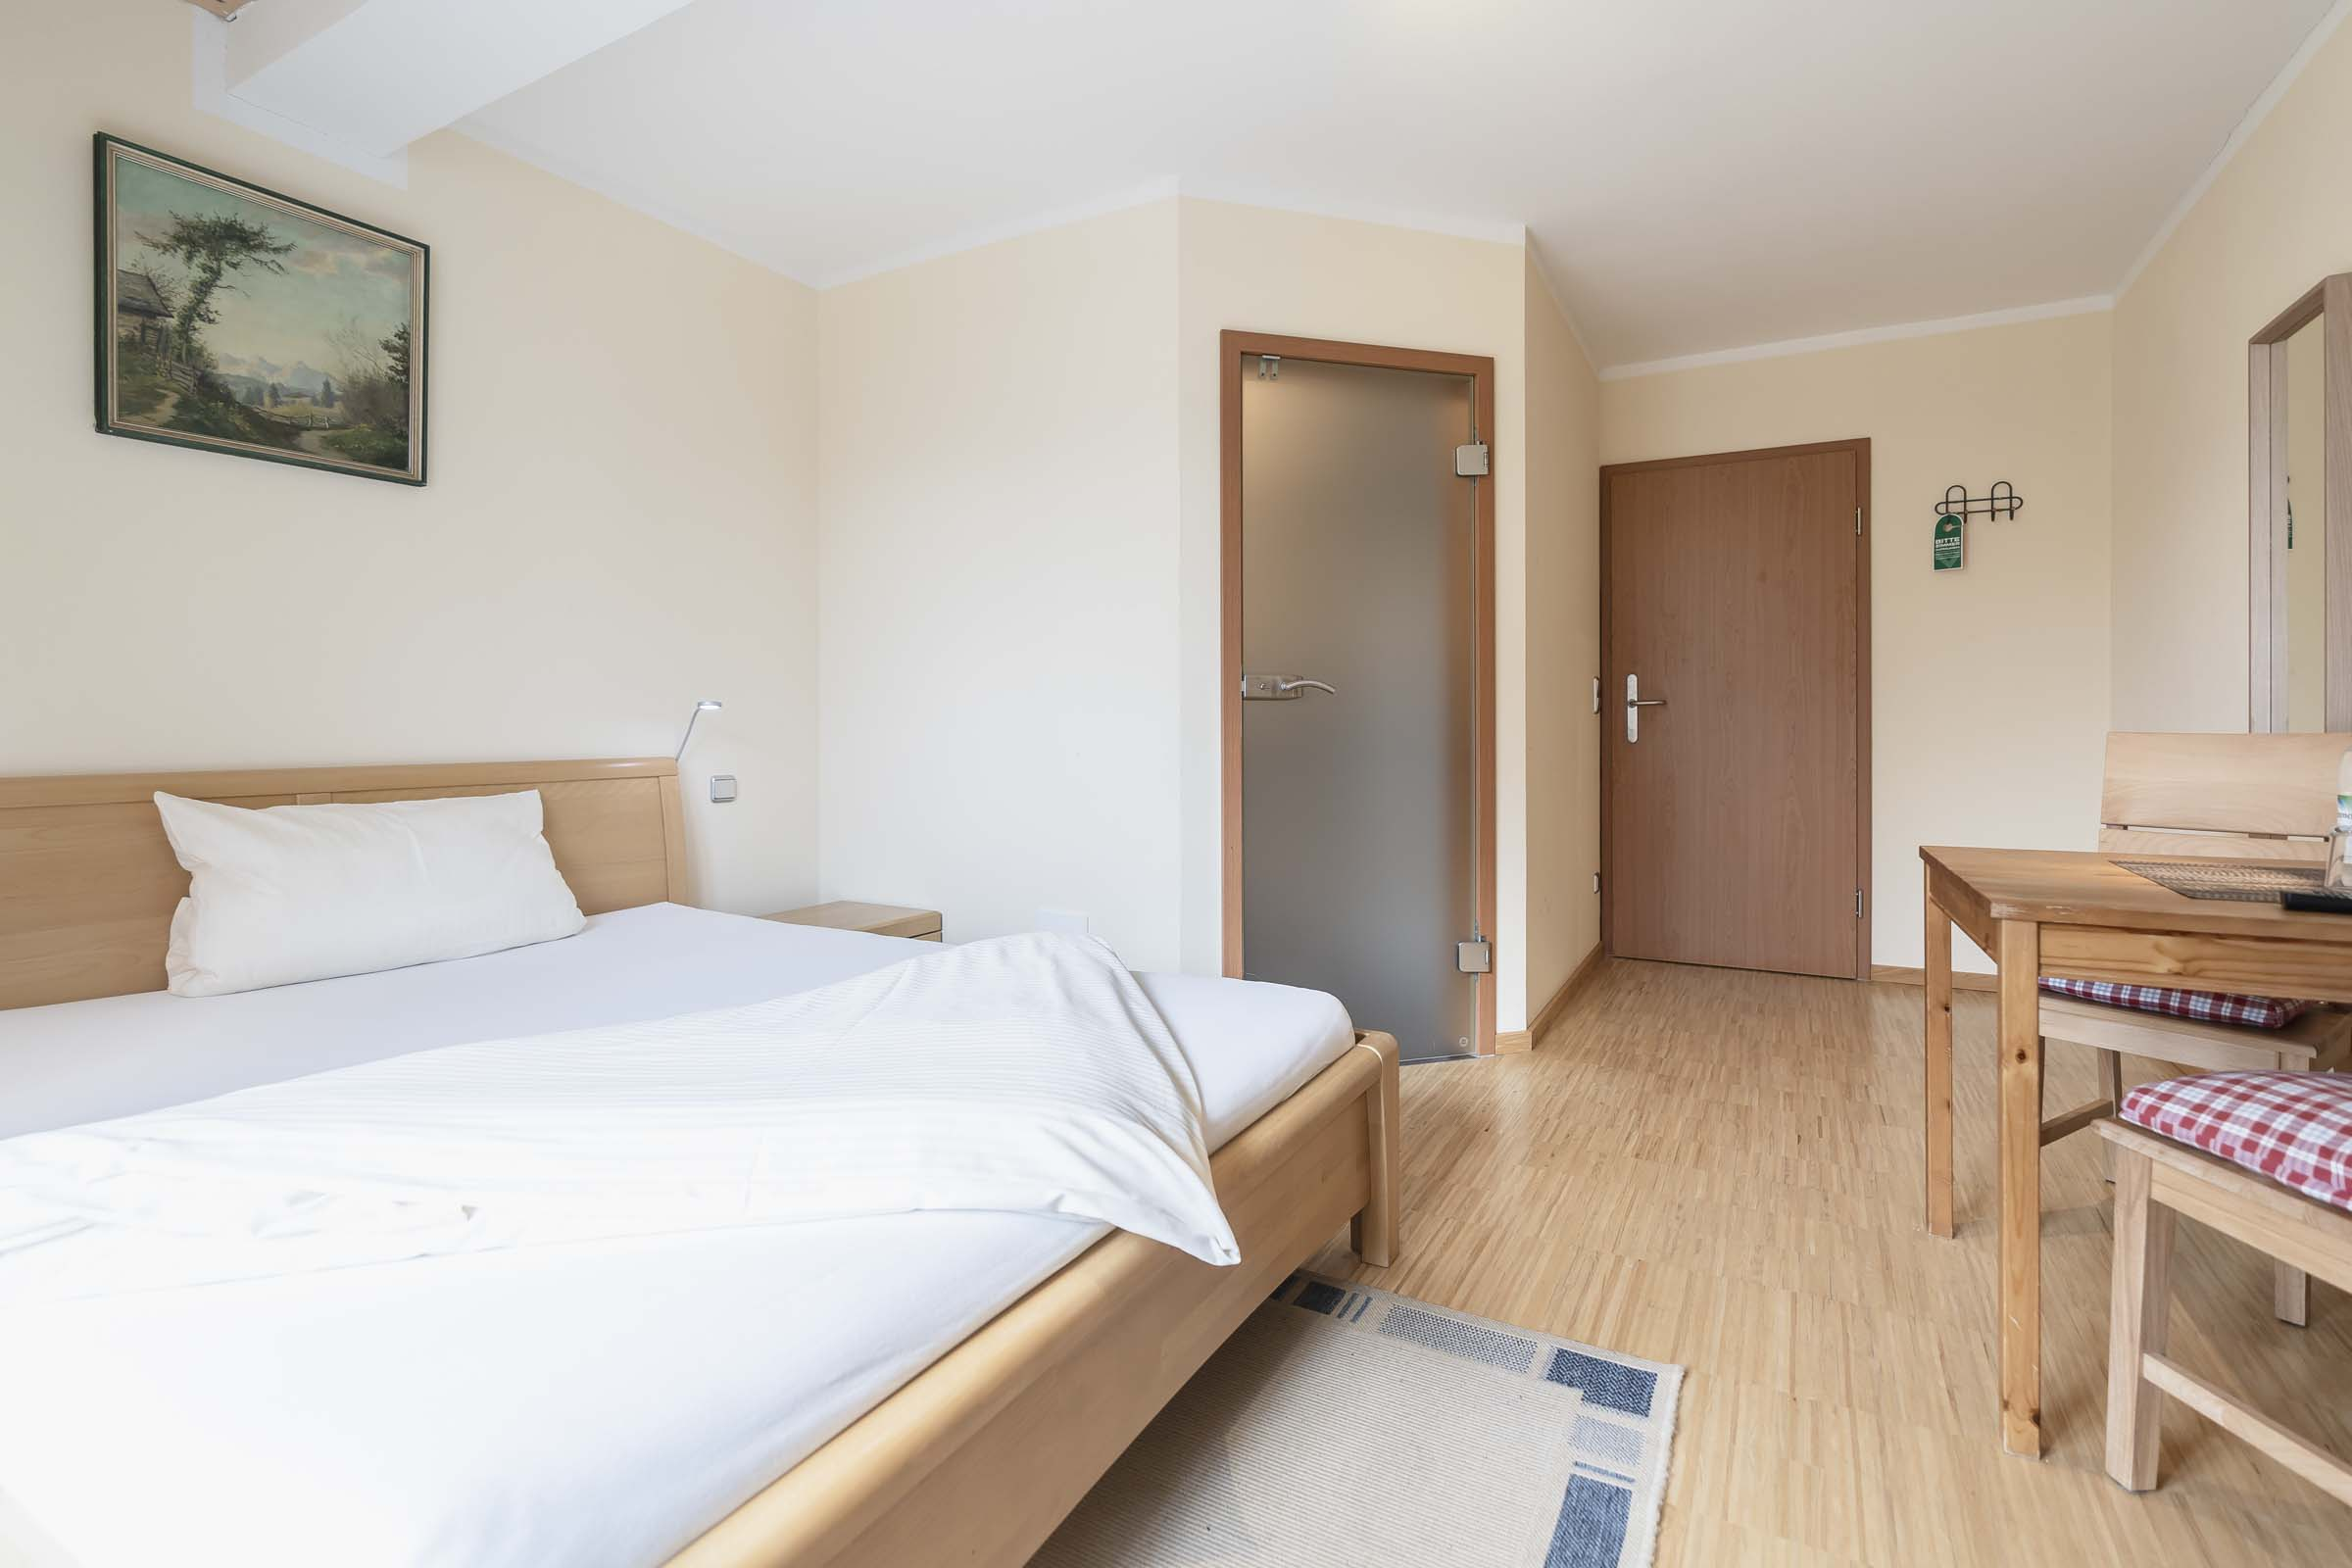 Hotel Haus Am Gries Murnau Single Room With Balcony